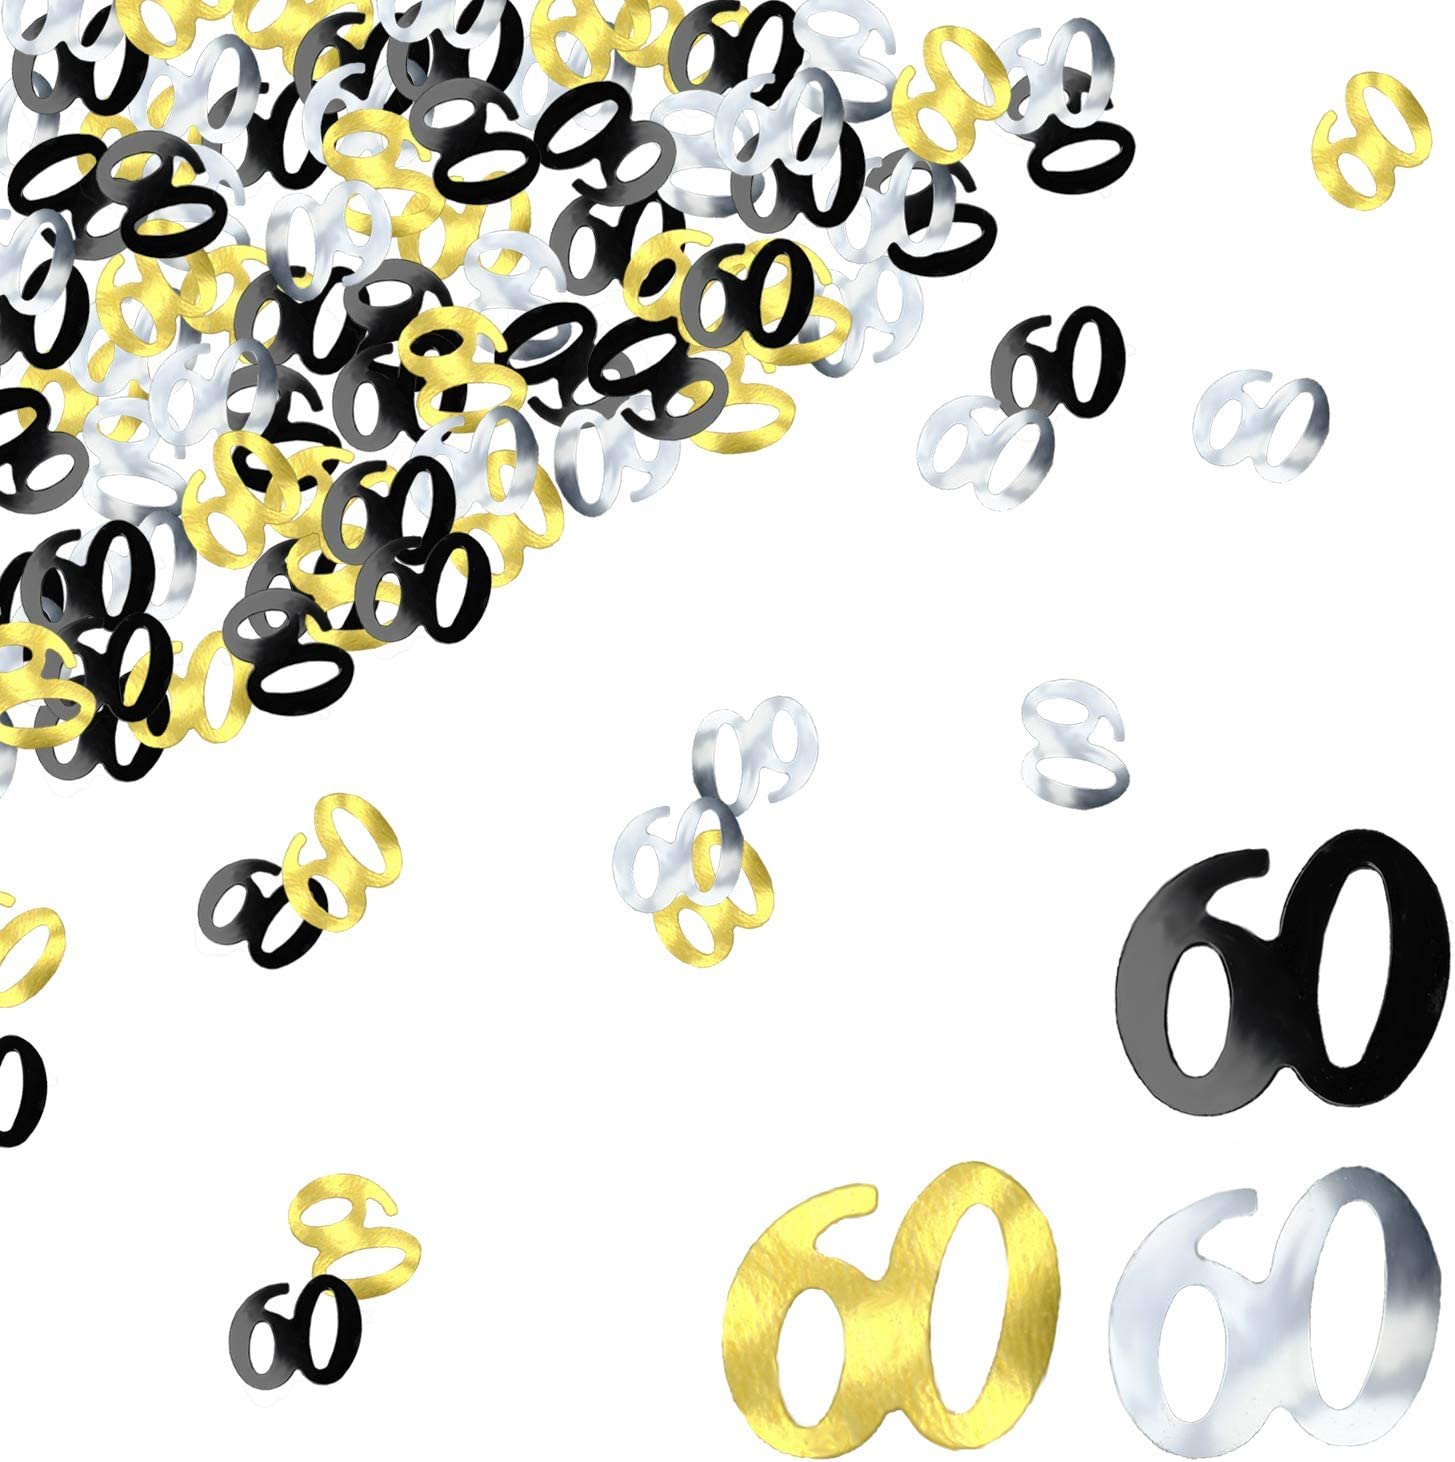 BEADNOVA 60th Birthday Confetti Sixty Years Old Confetti 60 Anniversary Number Confetti for Birthday Party Decor Wedding Table Decoration (1oz, Gold Silver Black Mix)